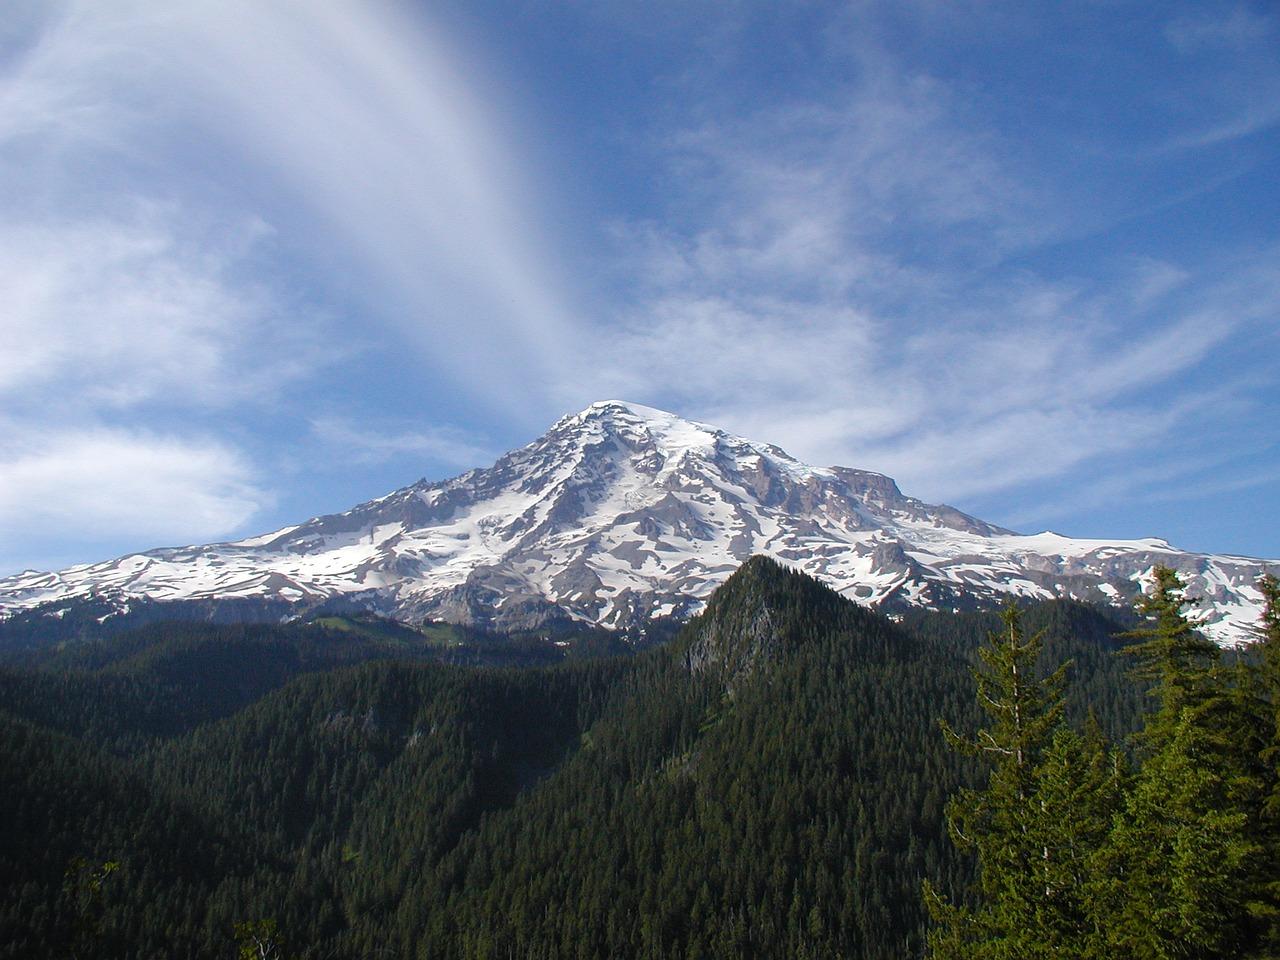 Alps homework help